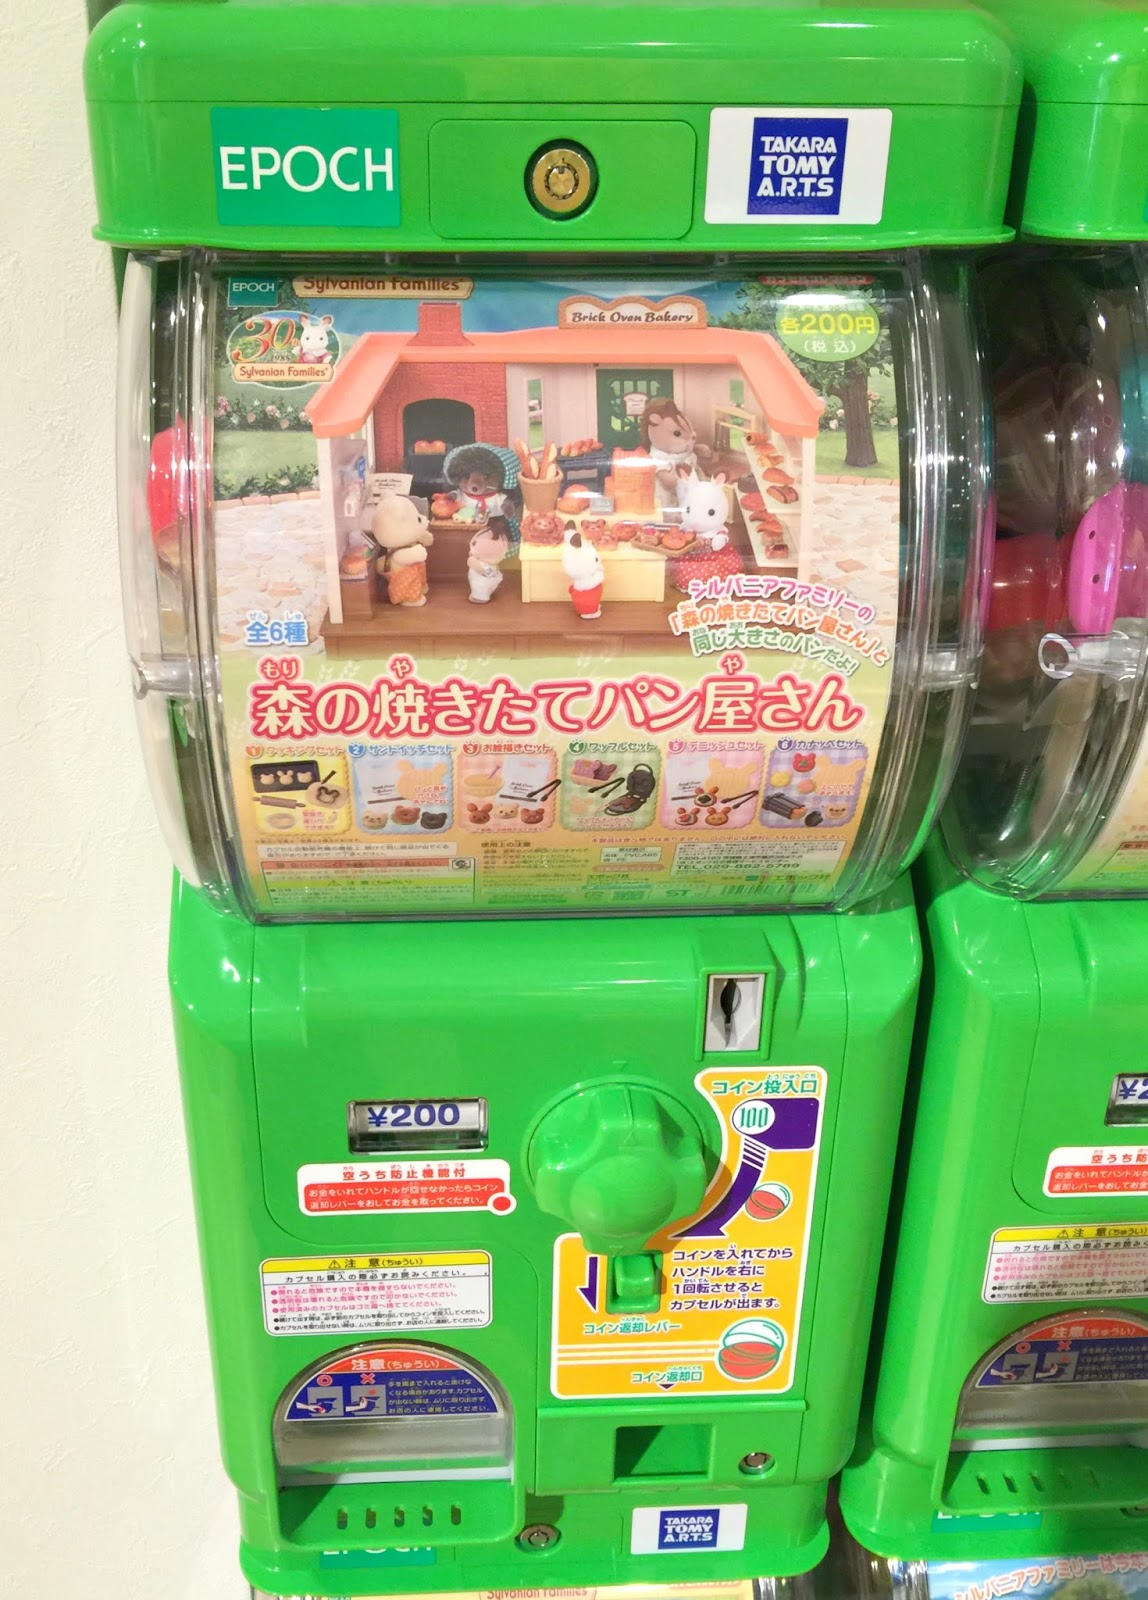 Sues Cutie Closet Gashapon Toy Machine Sylvanian Families Bakery